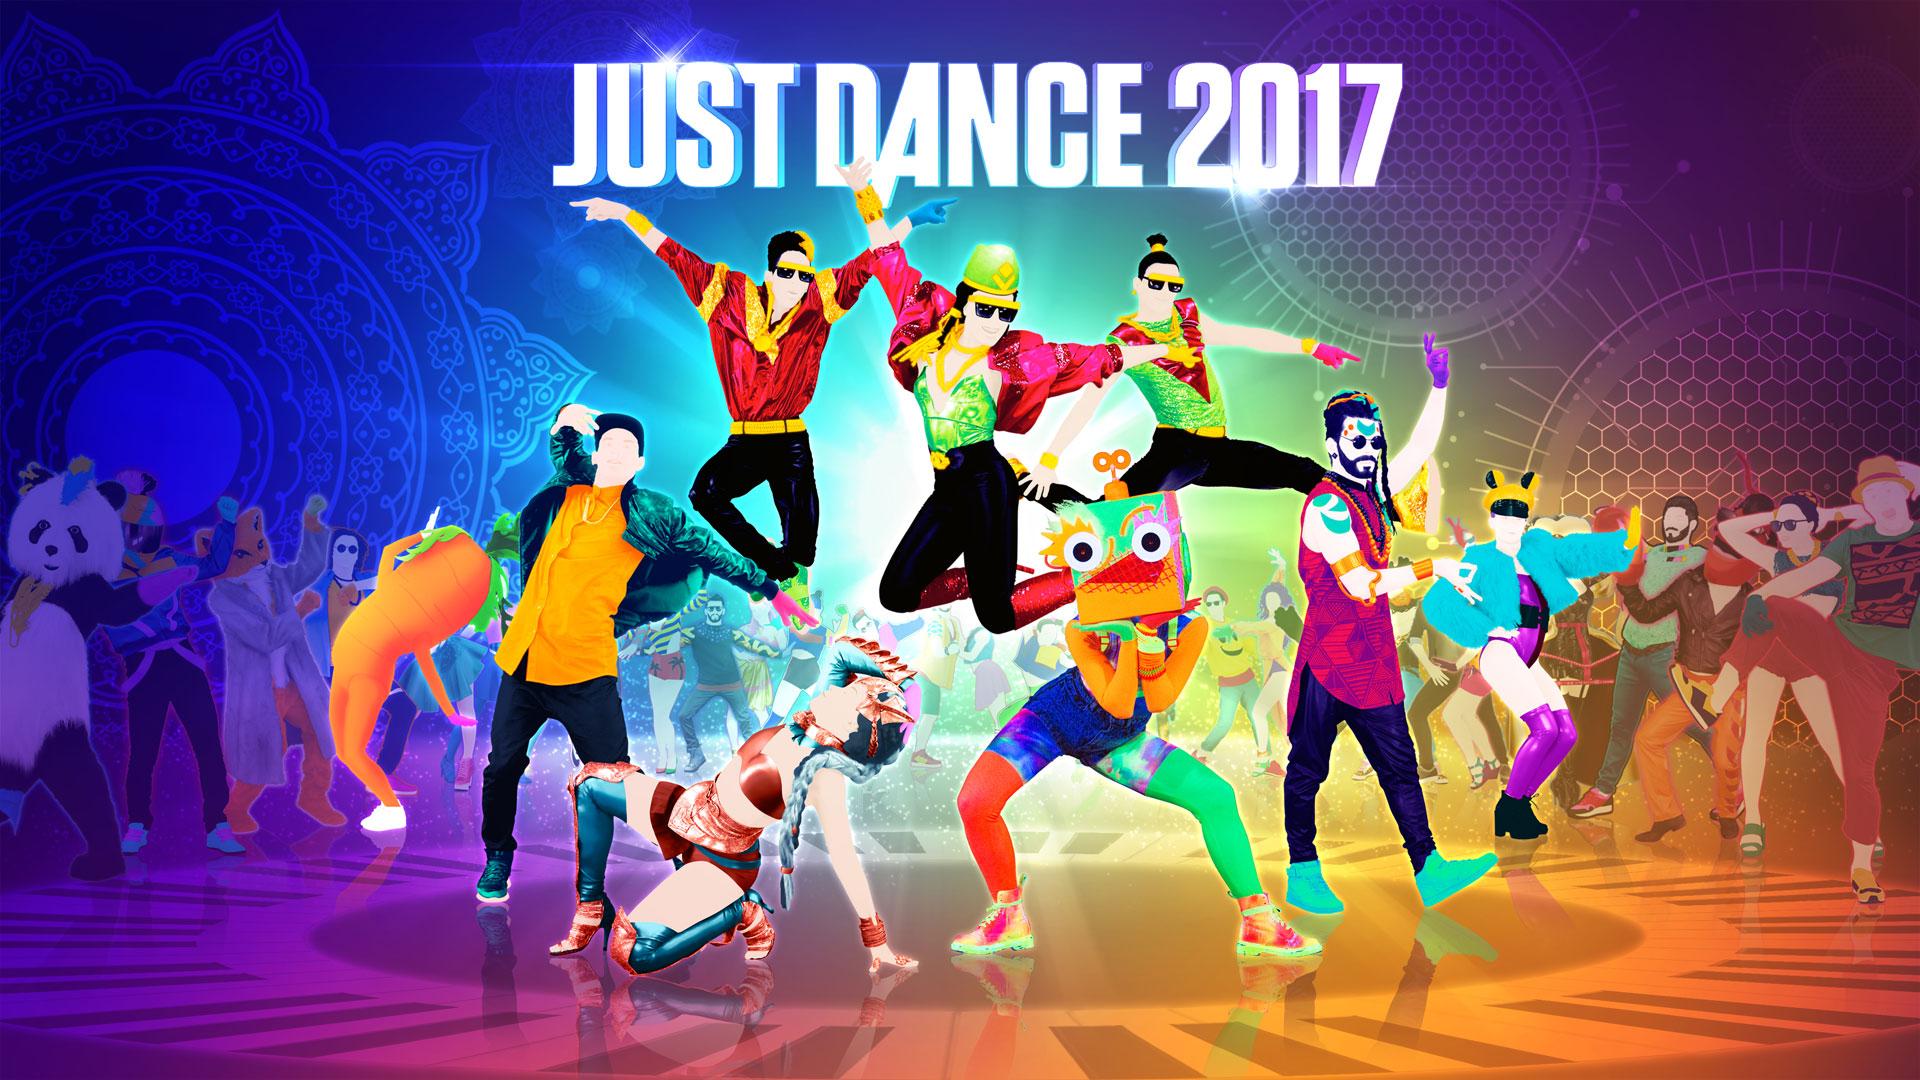 just_dance_2017_1